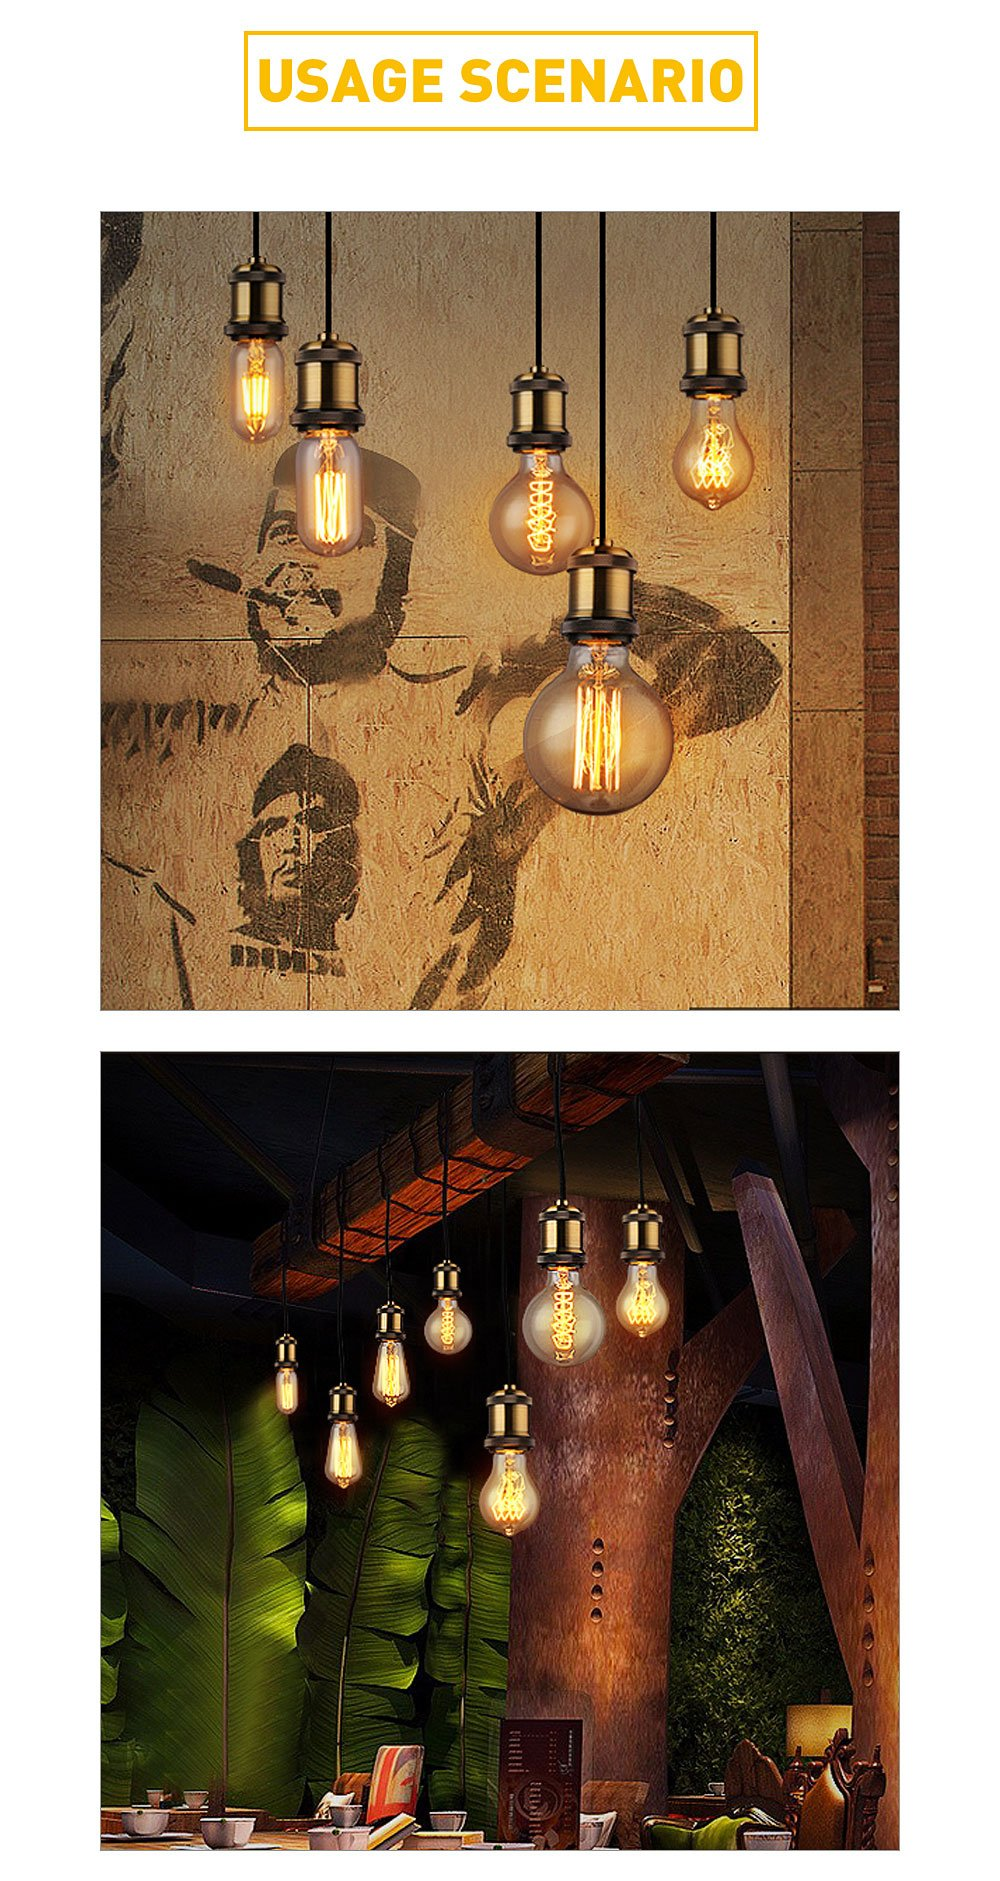 E26/E27 Vintage Edison Pendant Lamp Copper Holder,Solid Bronze Lamp Socket, Pendant Ceramics Light Socket Brass Finished Fixture Replacement, Industrial Vintage DIY Projects,UL Listed(4 Pack)